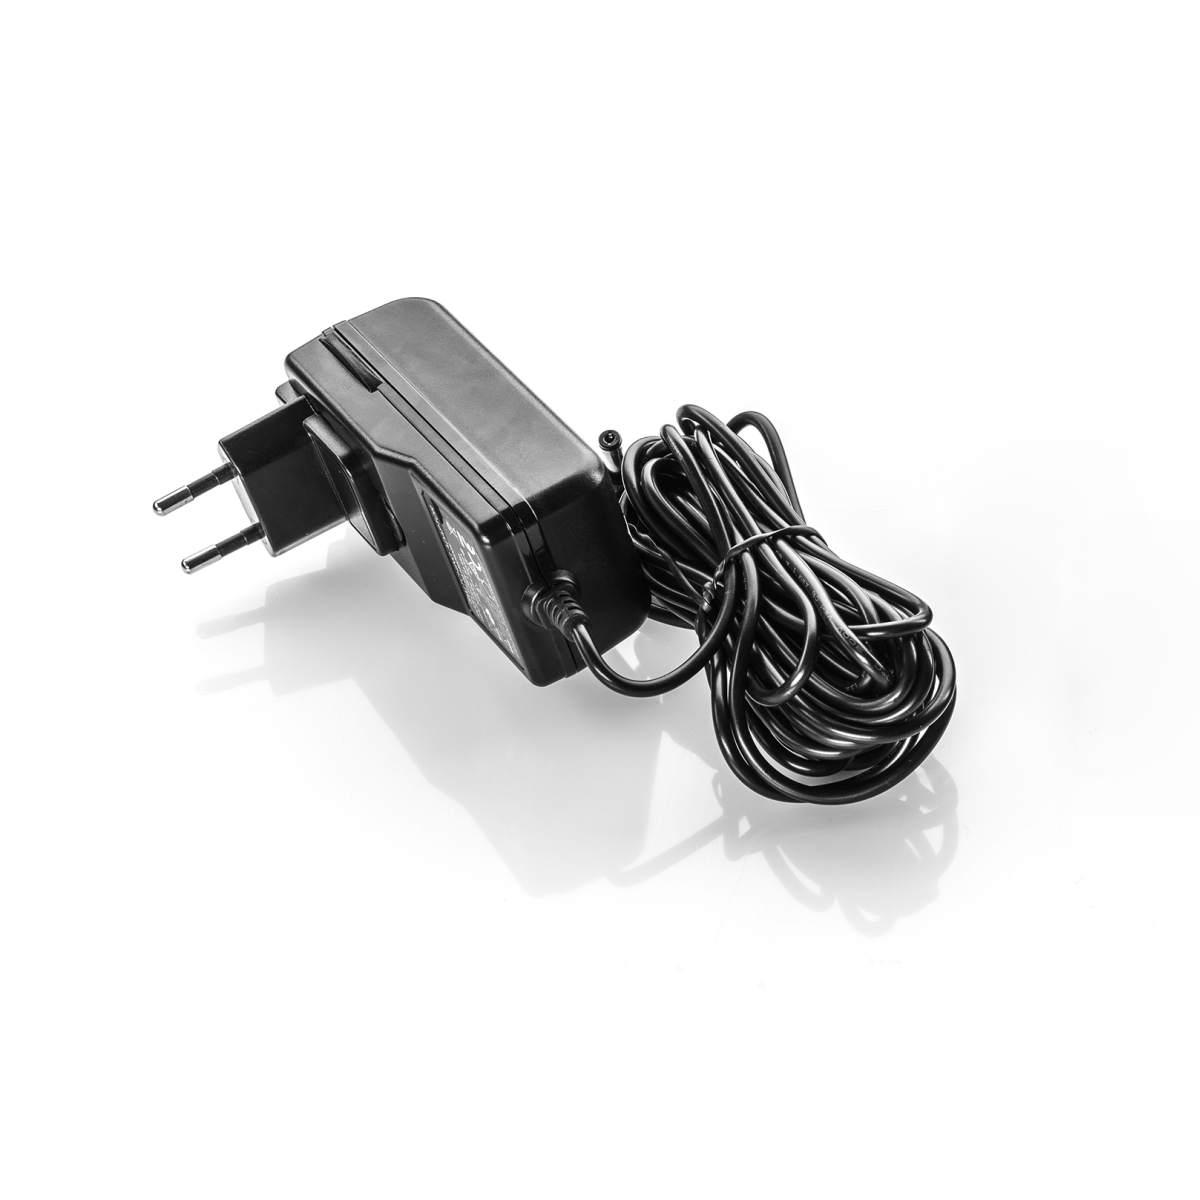 Walimex pro power adapter for LED Niova 150